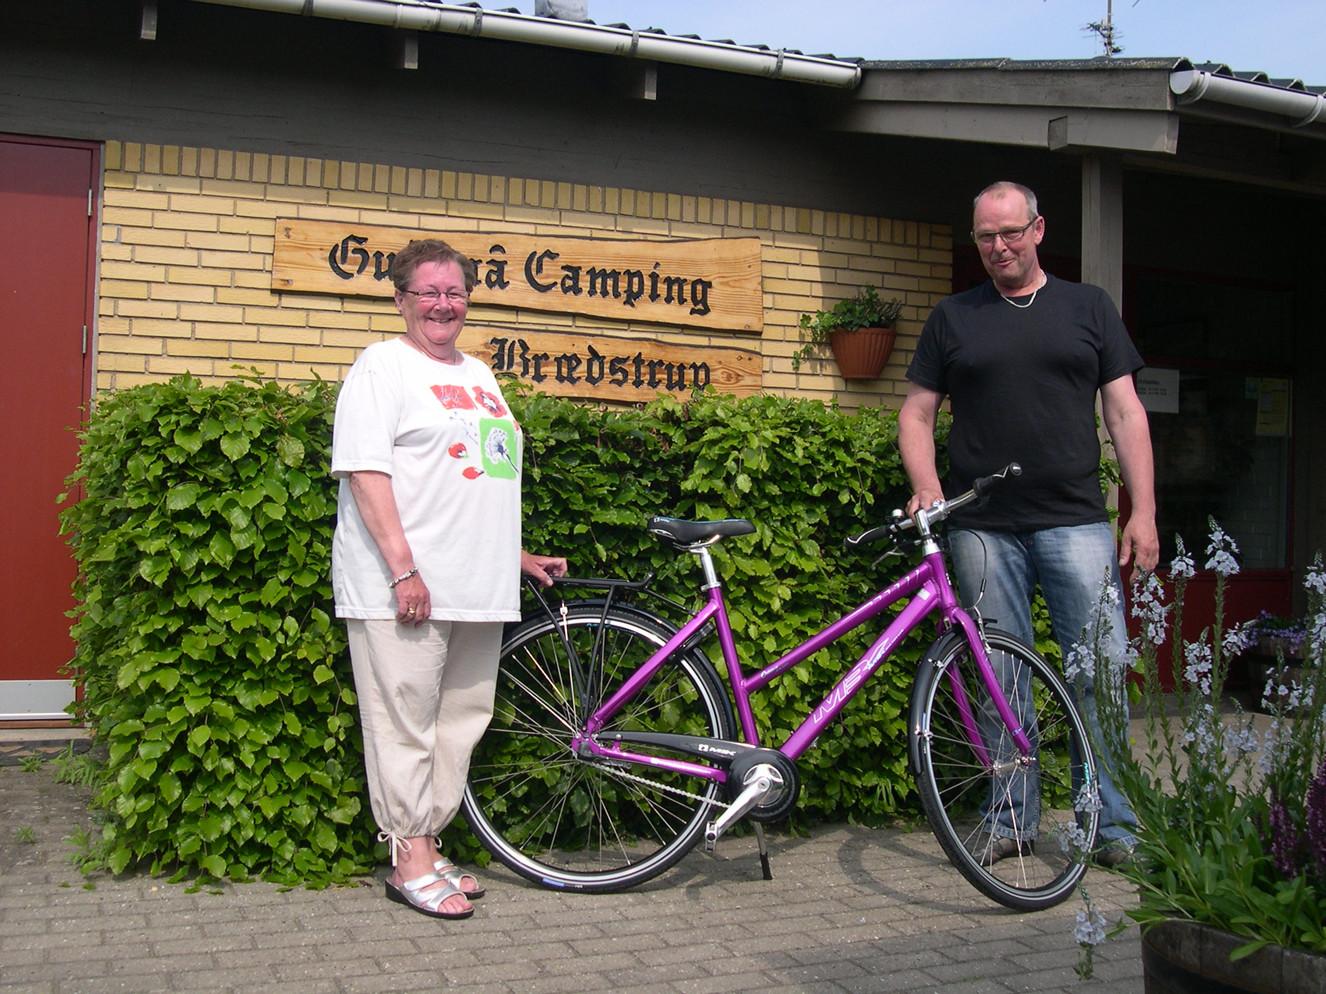 På fotoet: Inger Hansen, med sin nyanskaffede cykel, og cykelhandler Finn Johansen, Østbyens Cykler i Horsens, der sponserede cyklen.